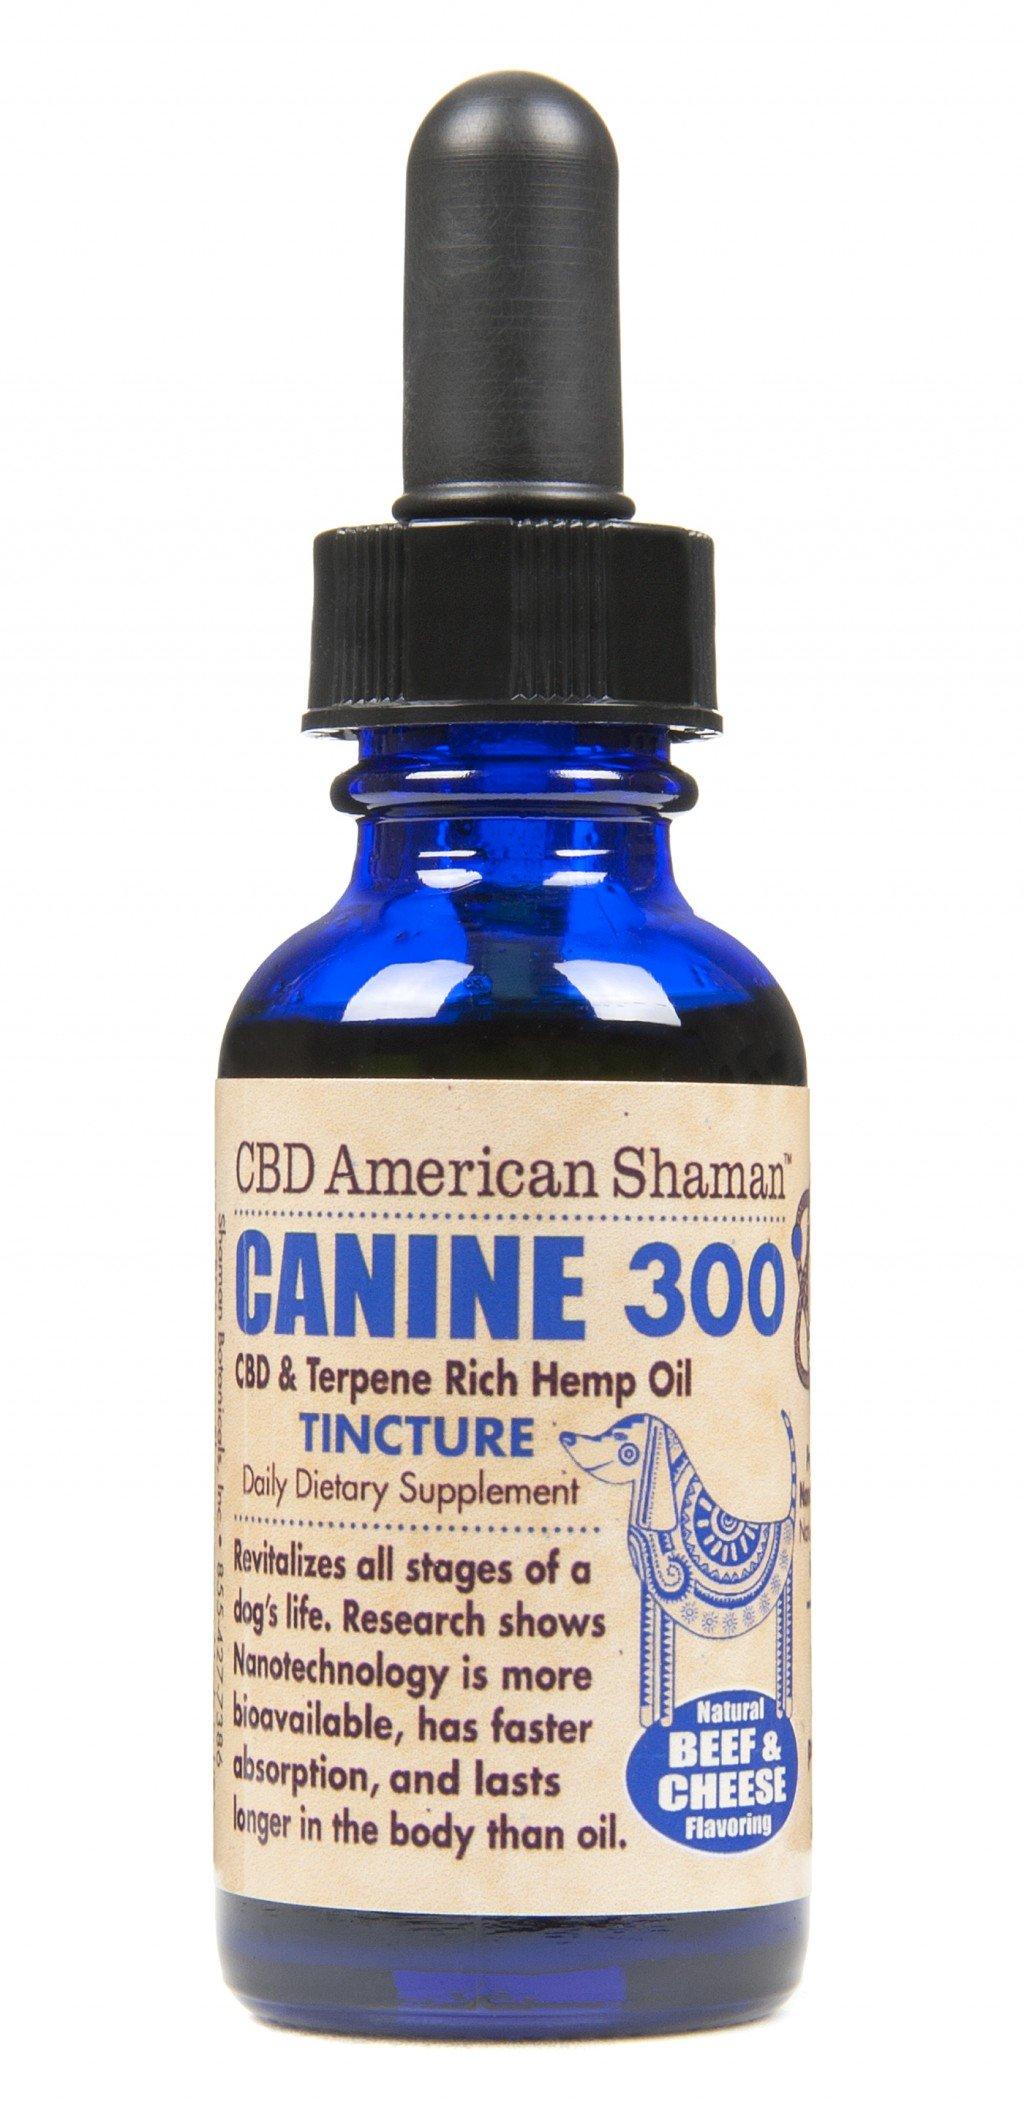 Canine CBD Hemp Oil Tincture American Shaman